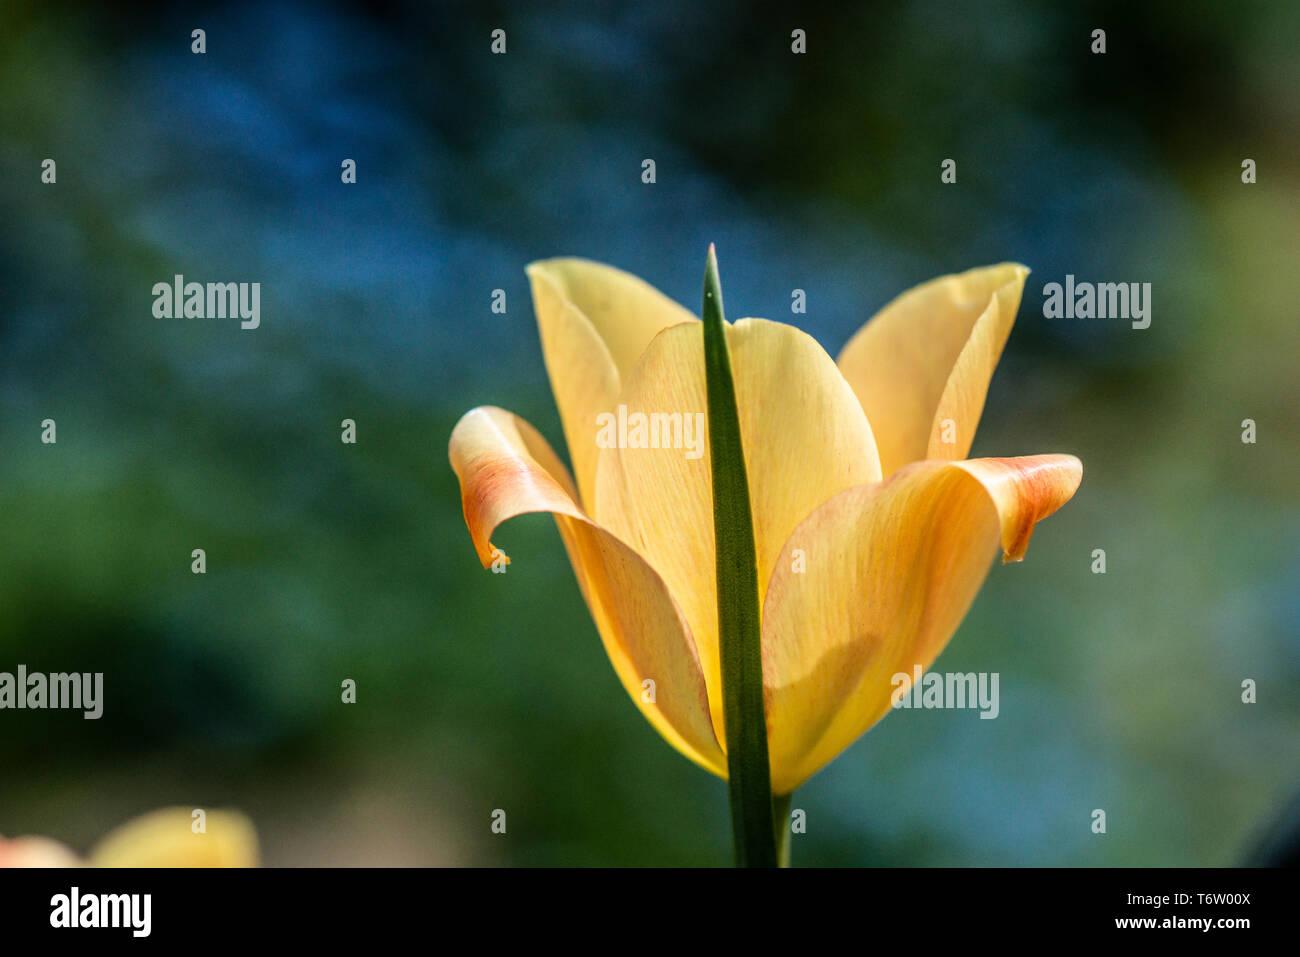 A yellow tulip flower Stock Photo